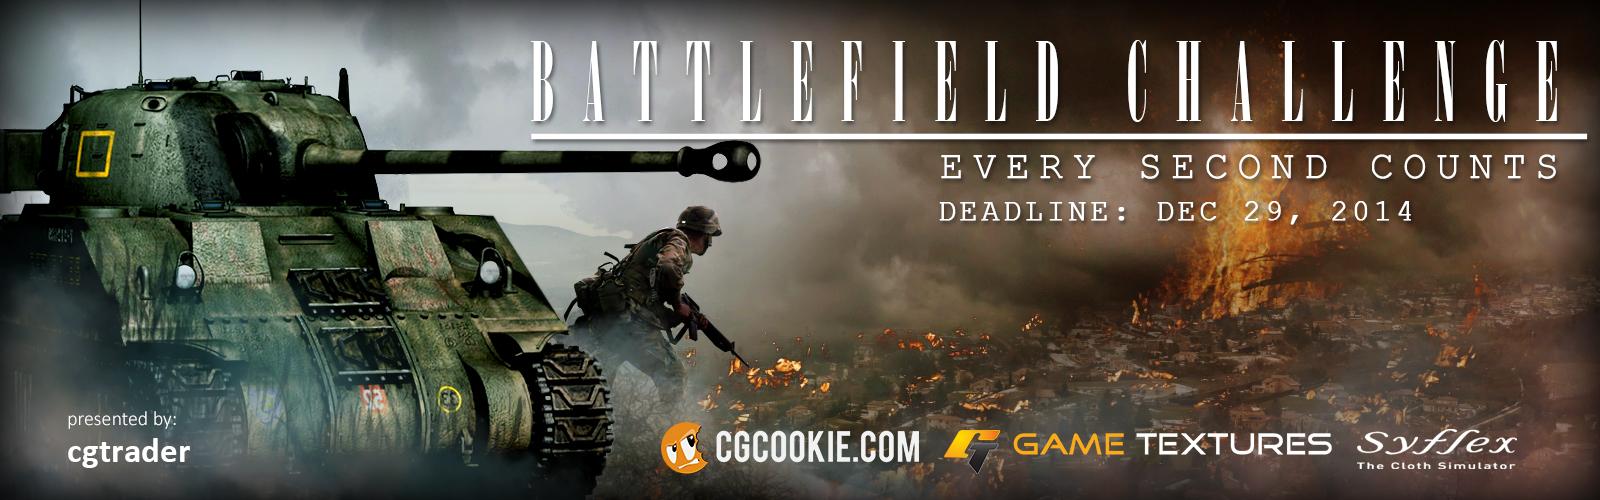 3D Battlefield Challenge